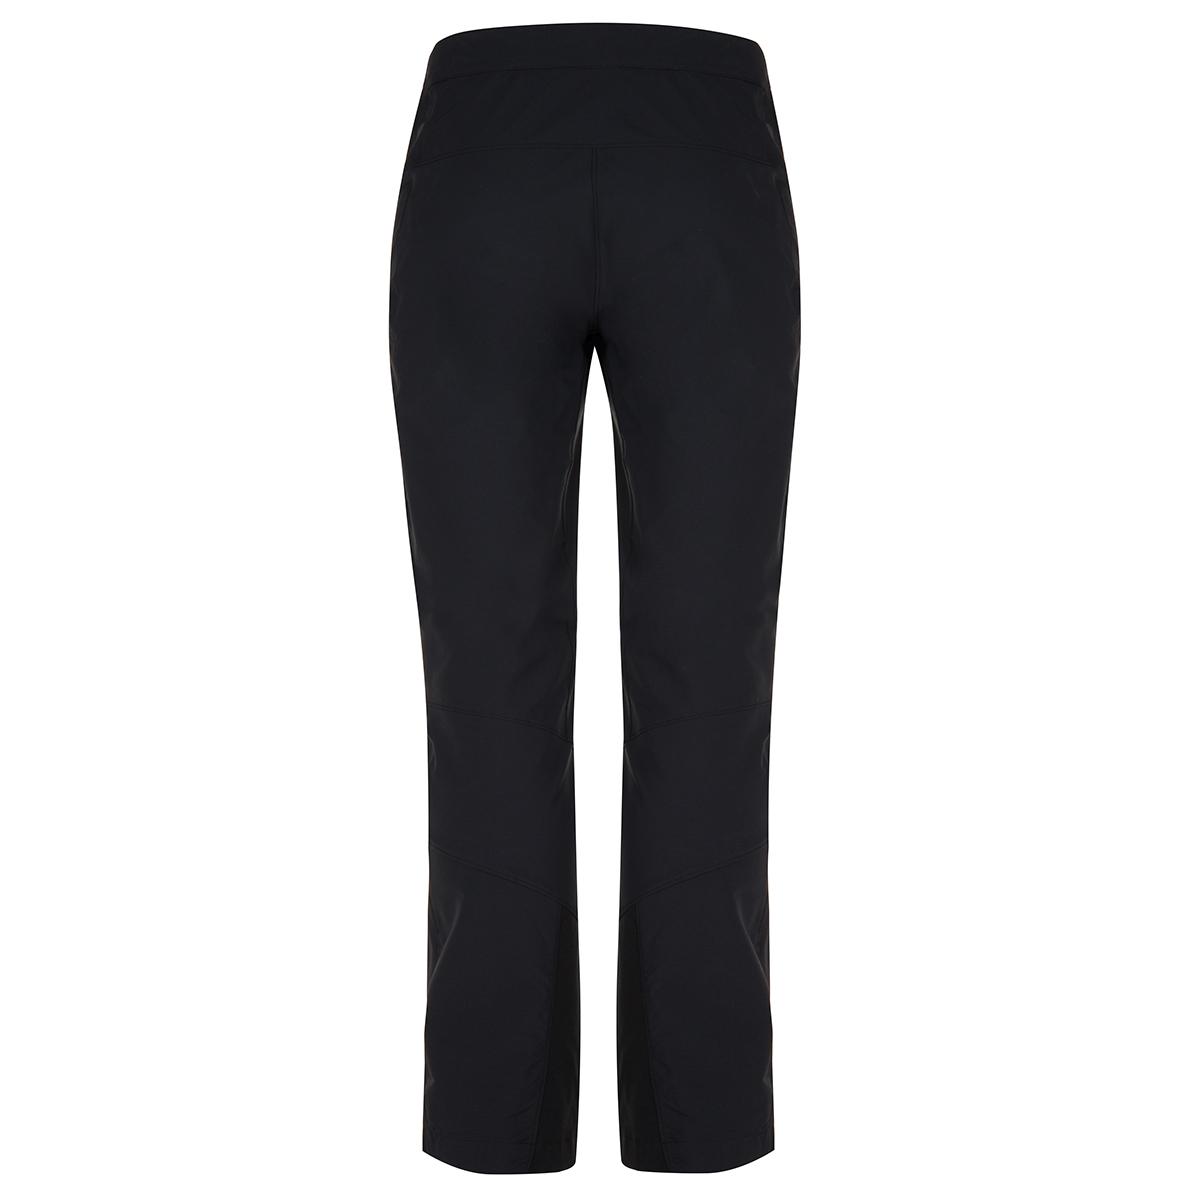 Zajo Air LT Neo Pants Black 2